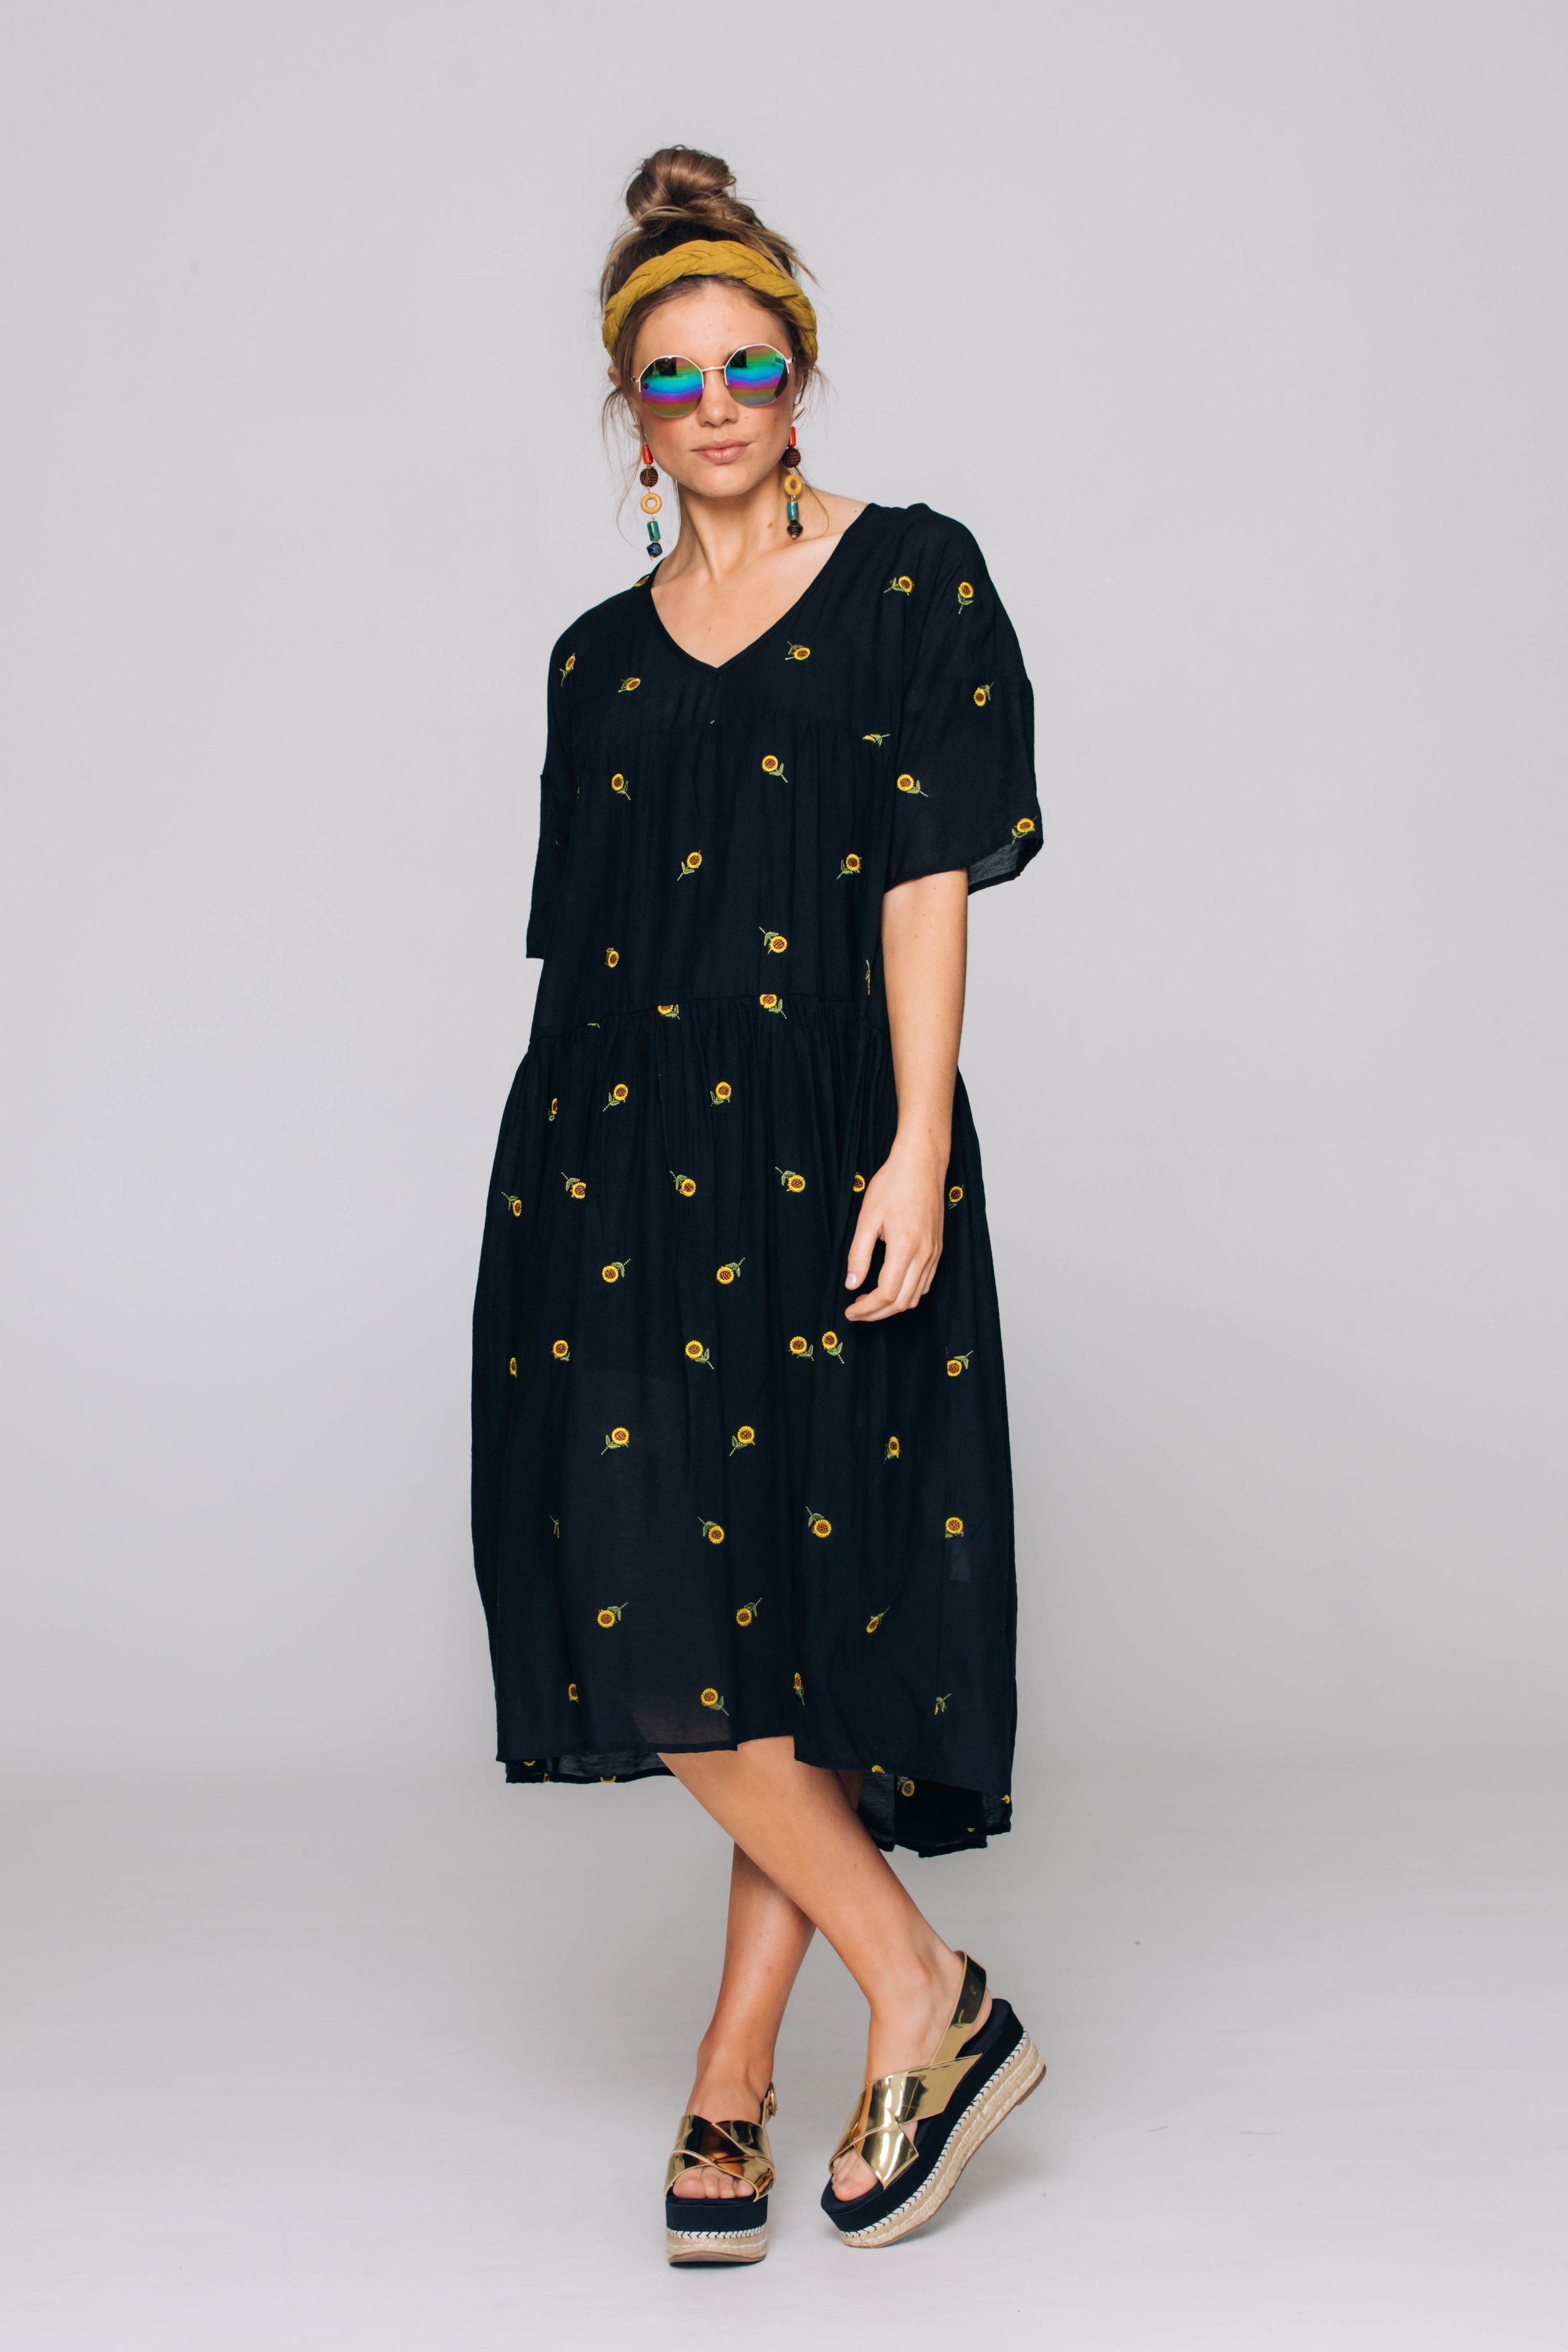 6241T Indie Dress, Suzi Sunflower Black